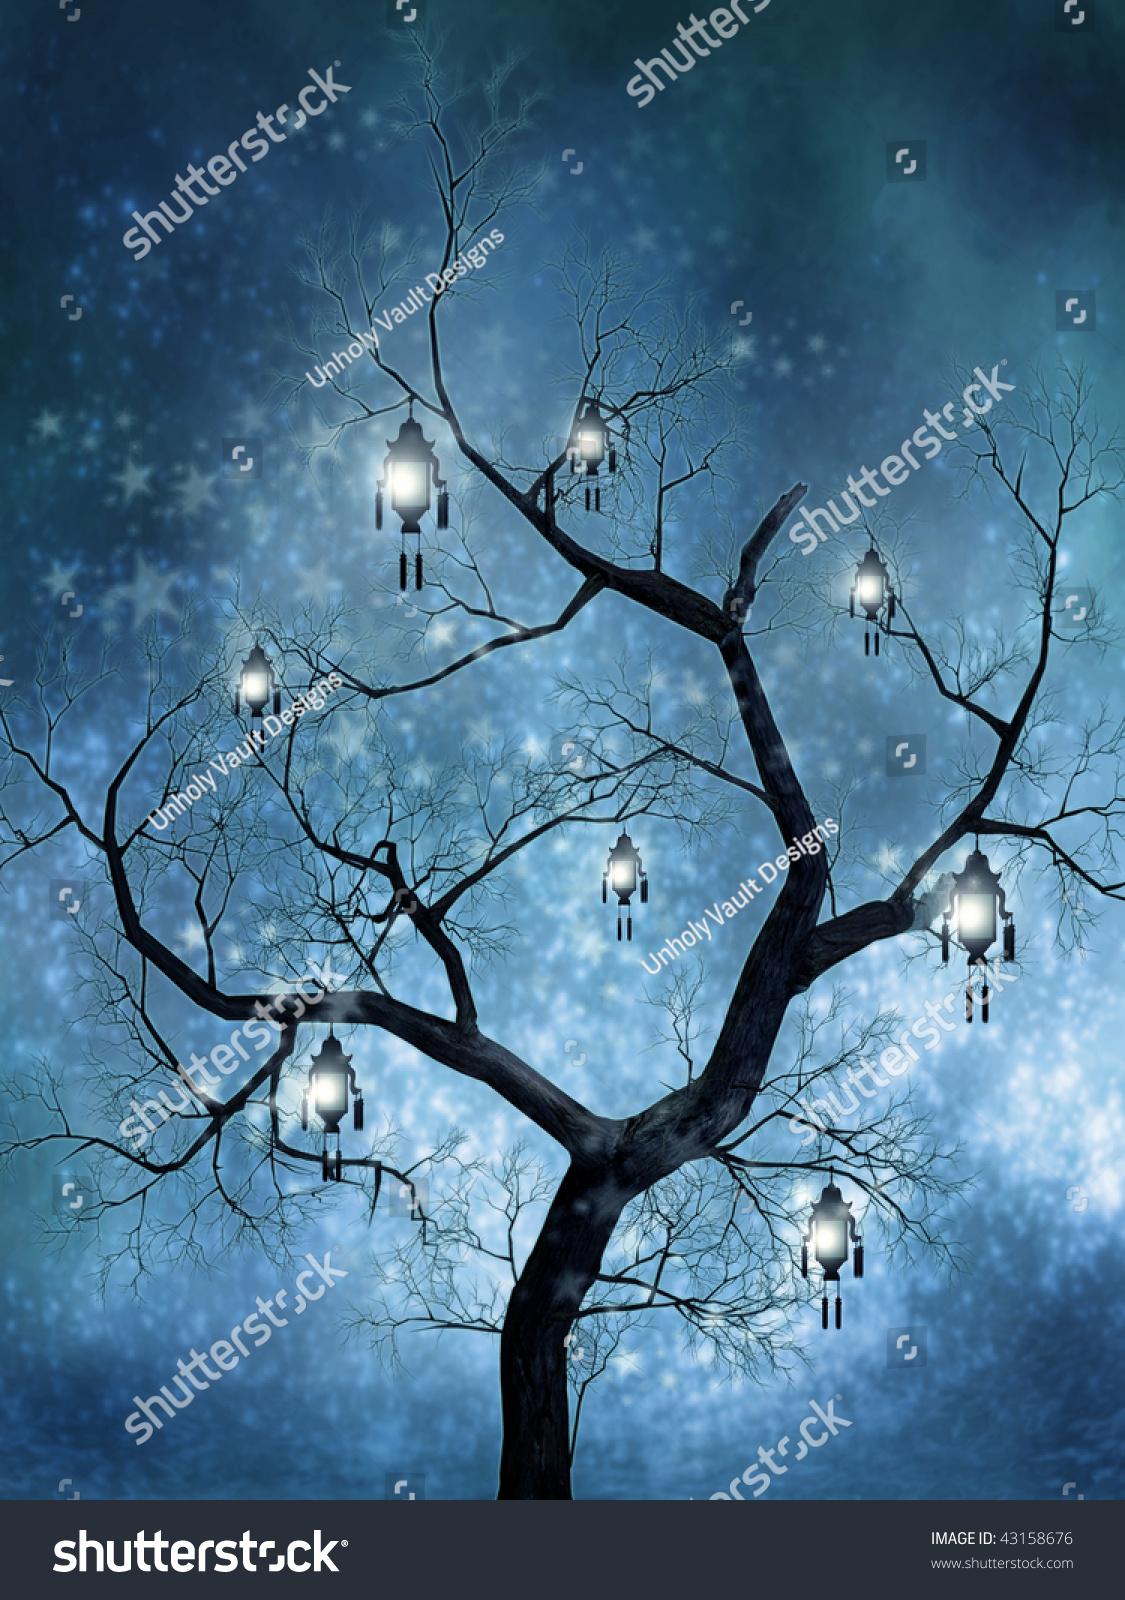 Worksheet Fairy Tree fairy tree lanterns sparkles stock illustration 43158676 with and sparkles